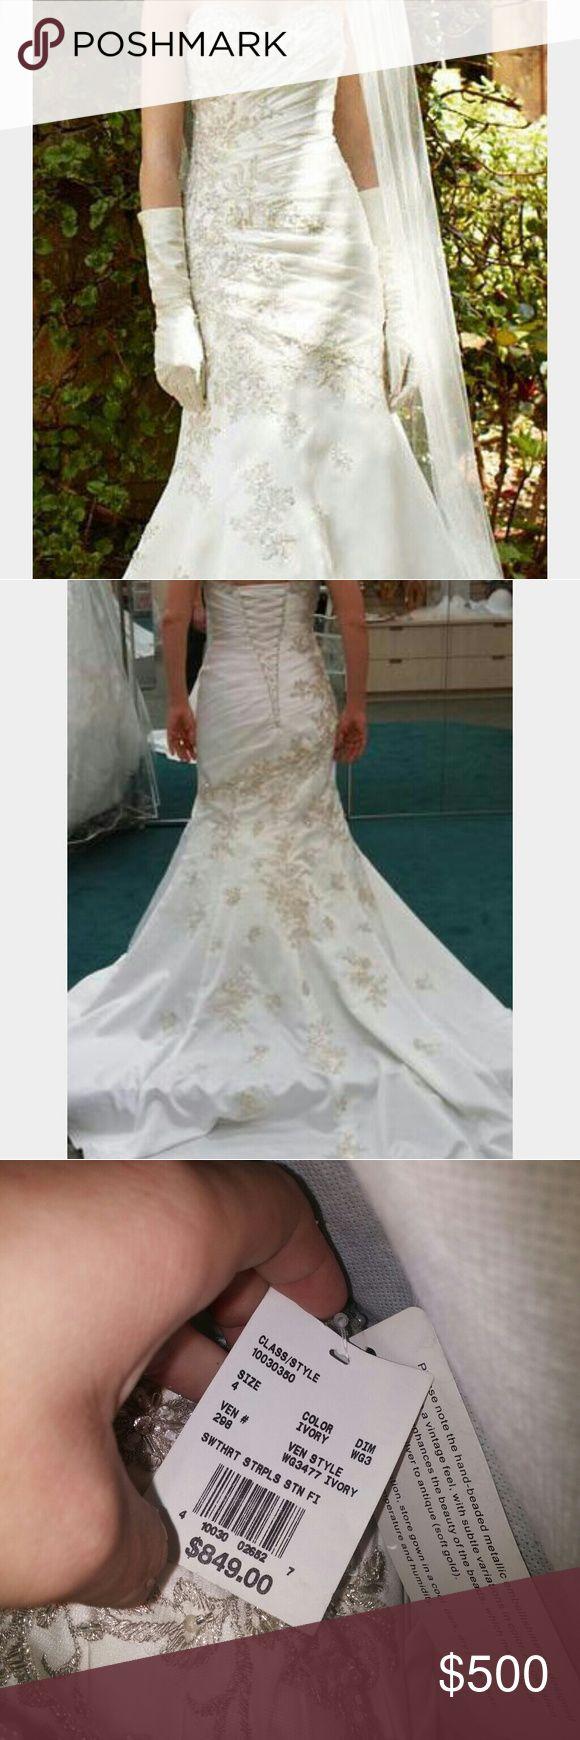 David's bridal wedding gown Brand new never worn size 4 wedding dress. Beautiful! David's Bridal Dresses Wedding